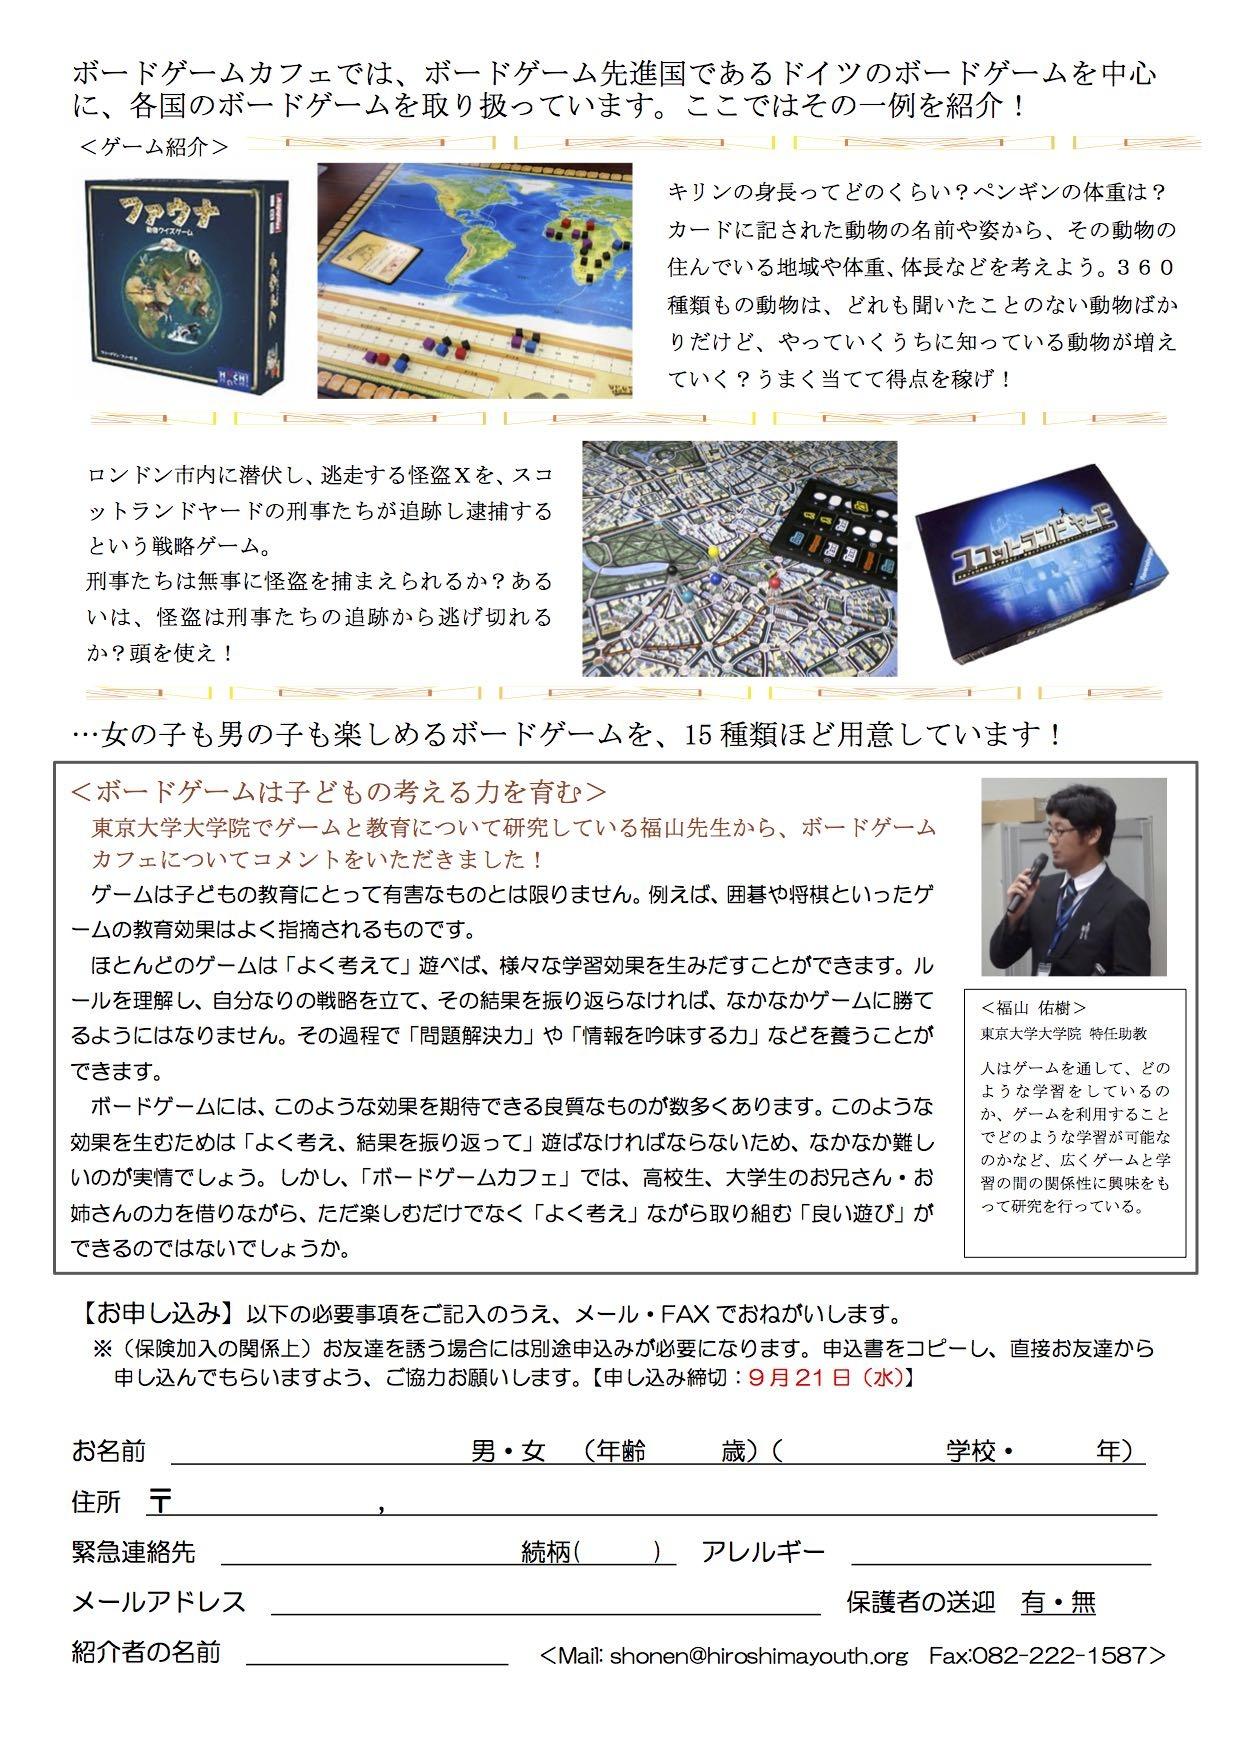 20160909_Board Game Cafeお知らせ文書_裏.jpg